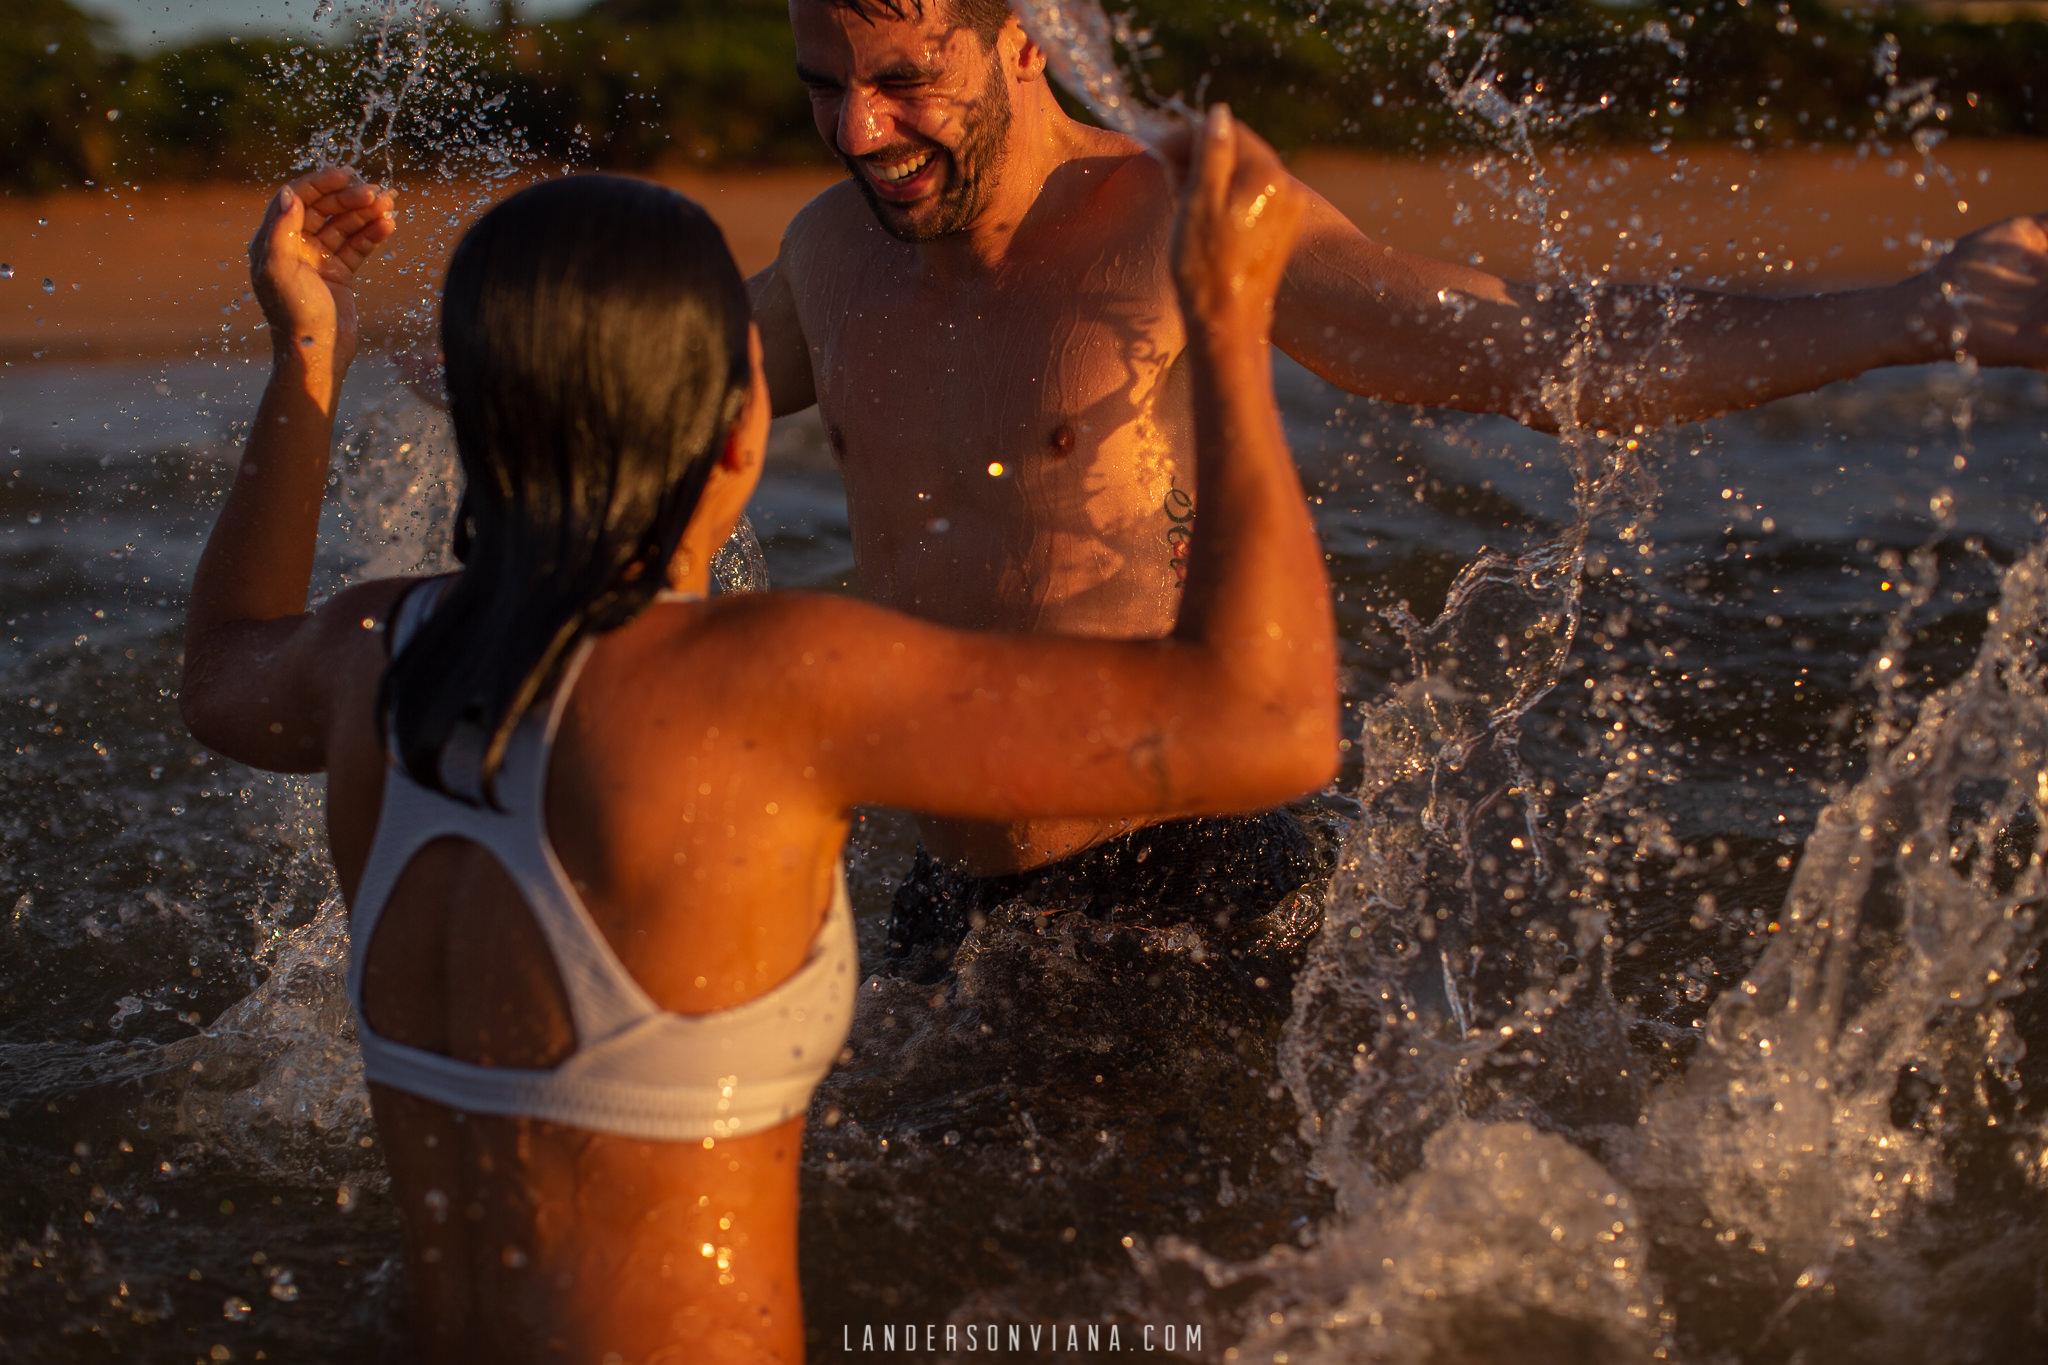 ensaio-pre-wedding-praia-landerson-viana-fotografia-casamento-pegueiobouquet-78.jpg